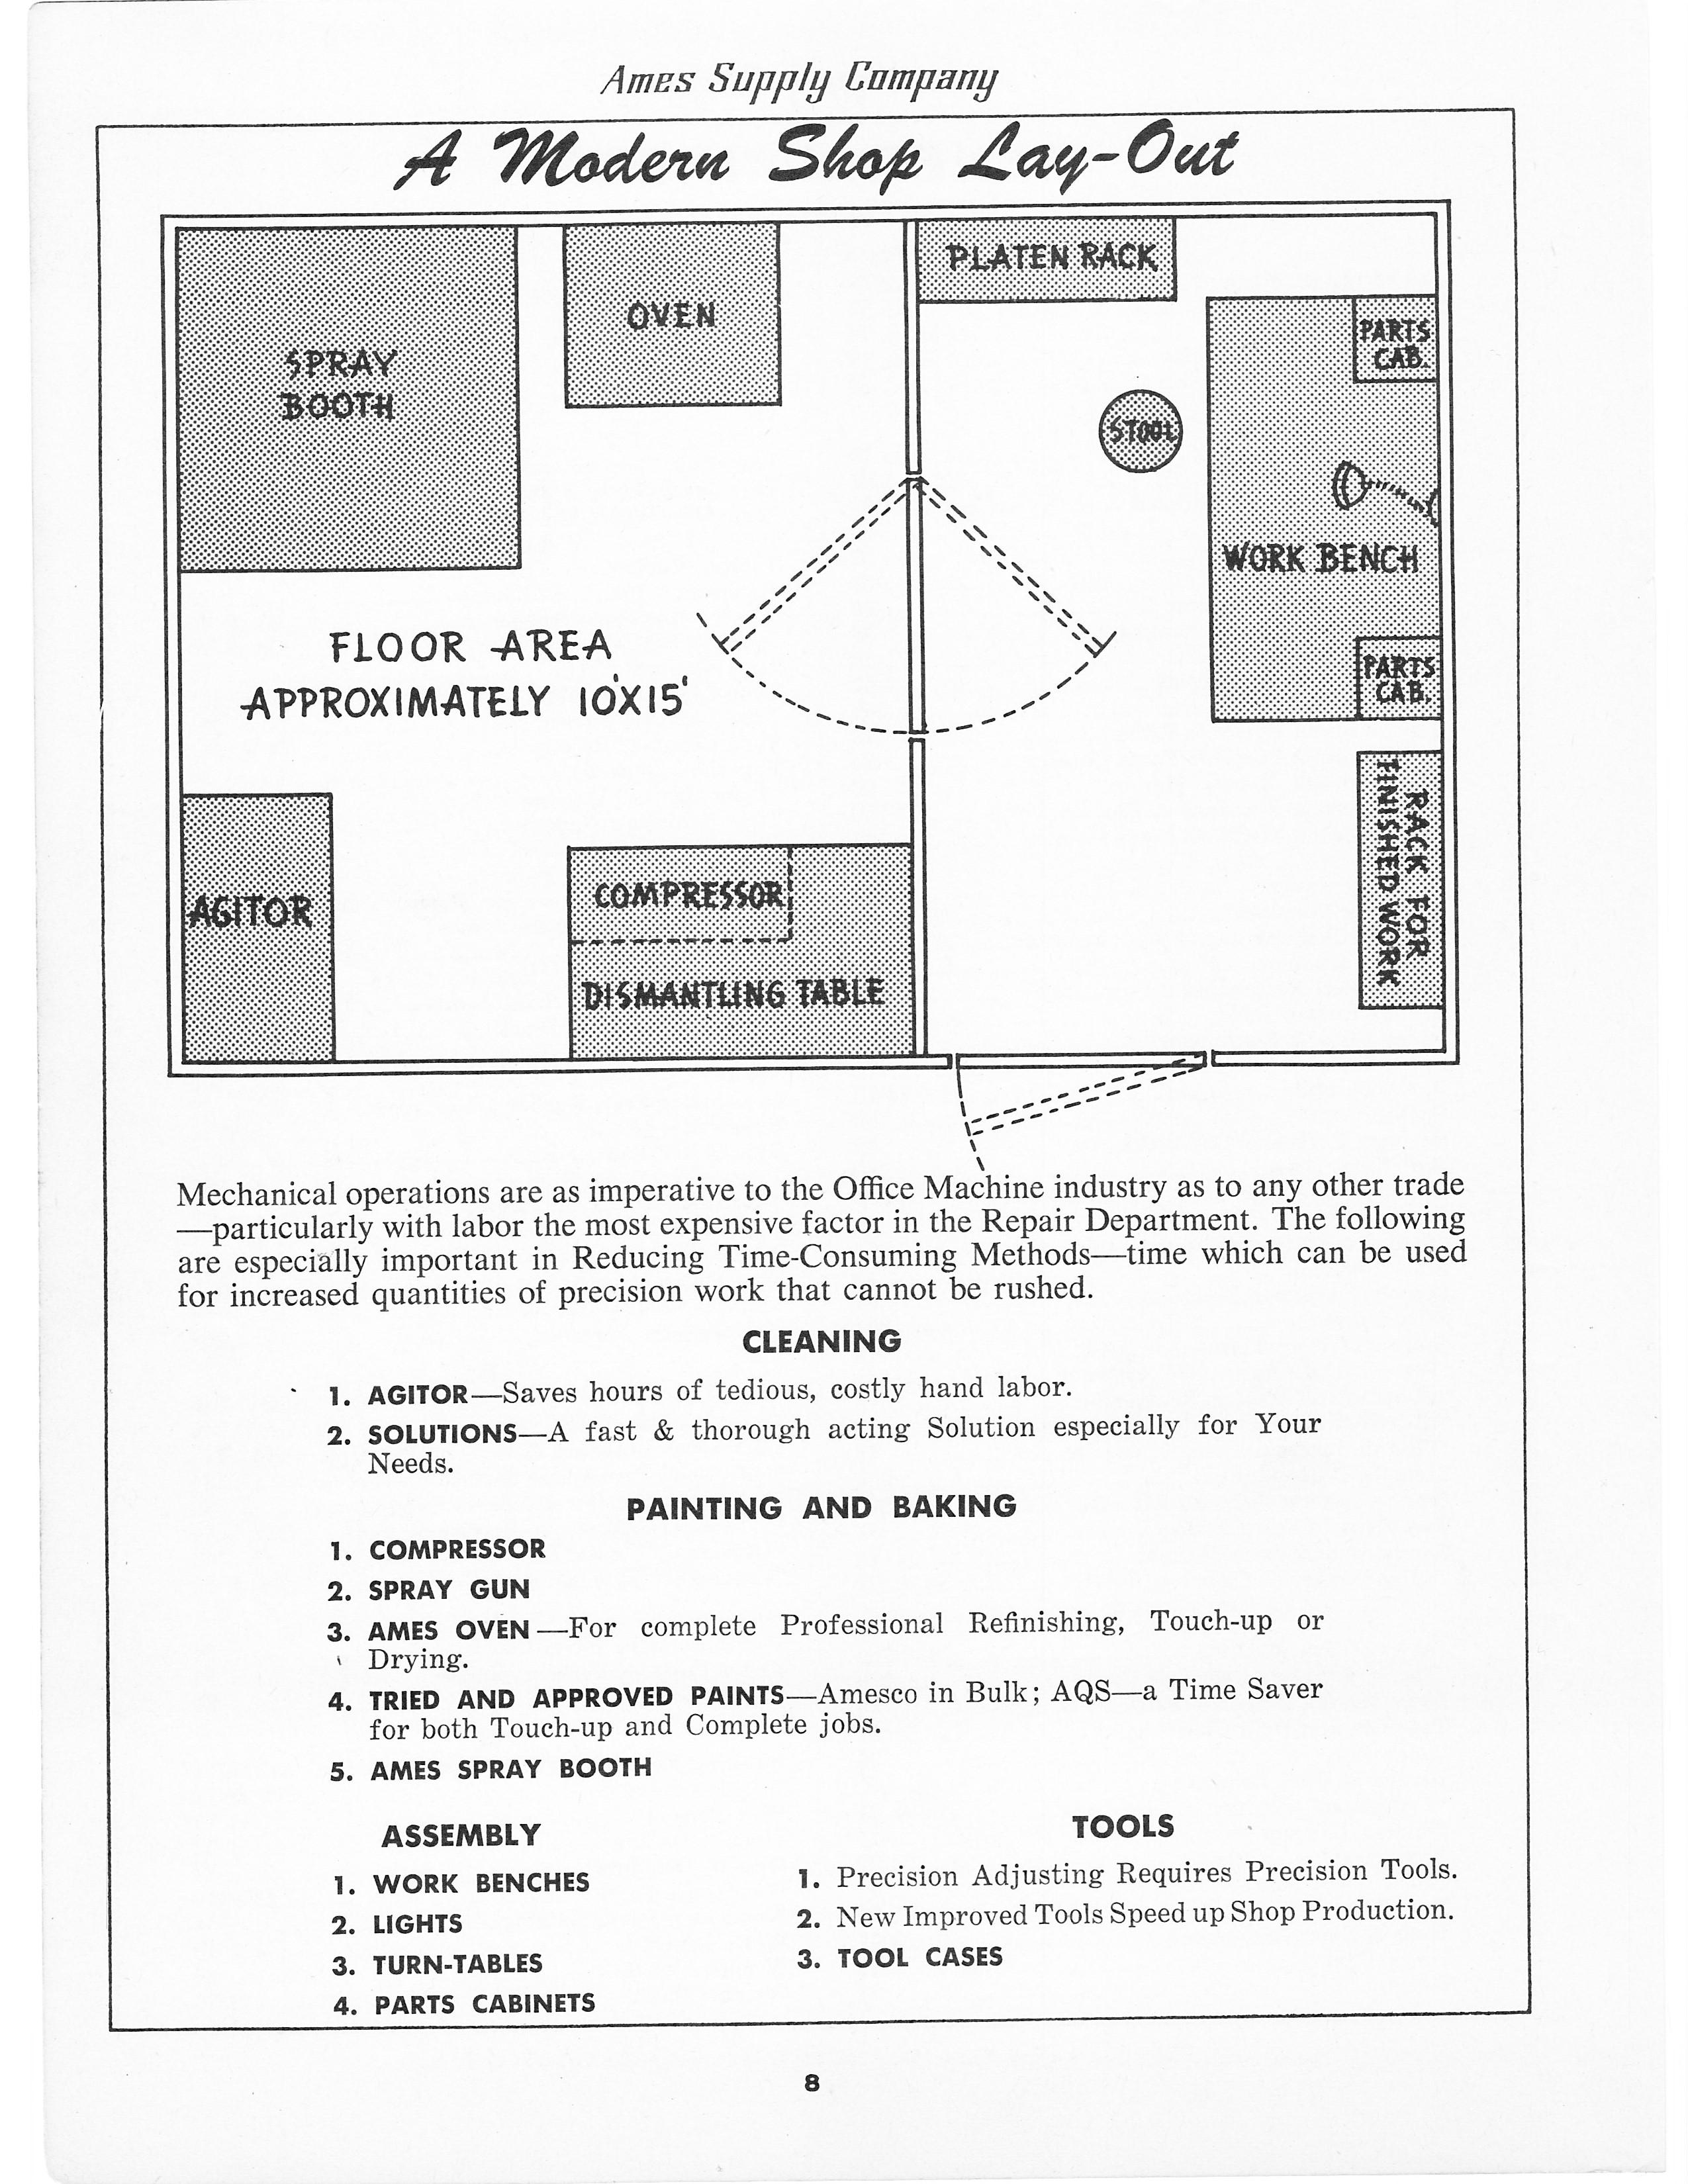 100 Ames 5 Cu Ft Total Shop Electric Ranges At